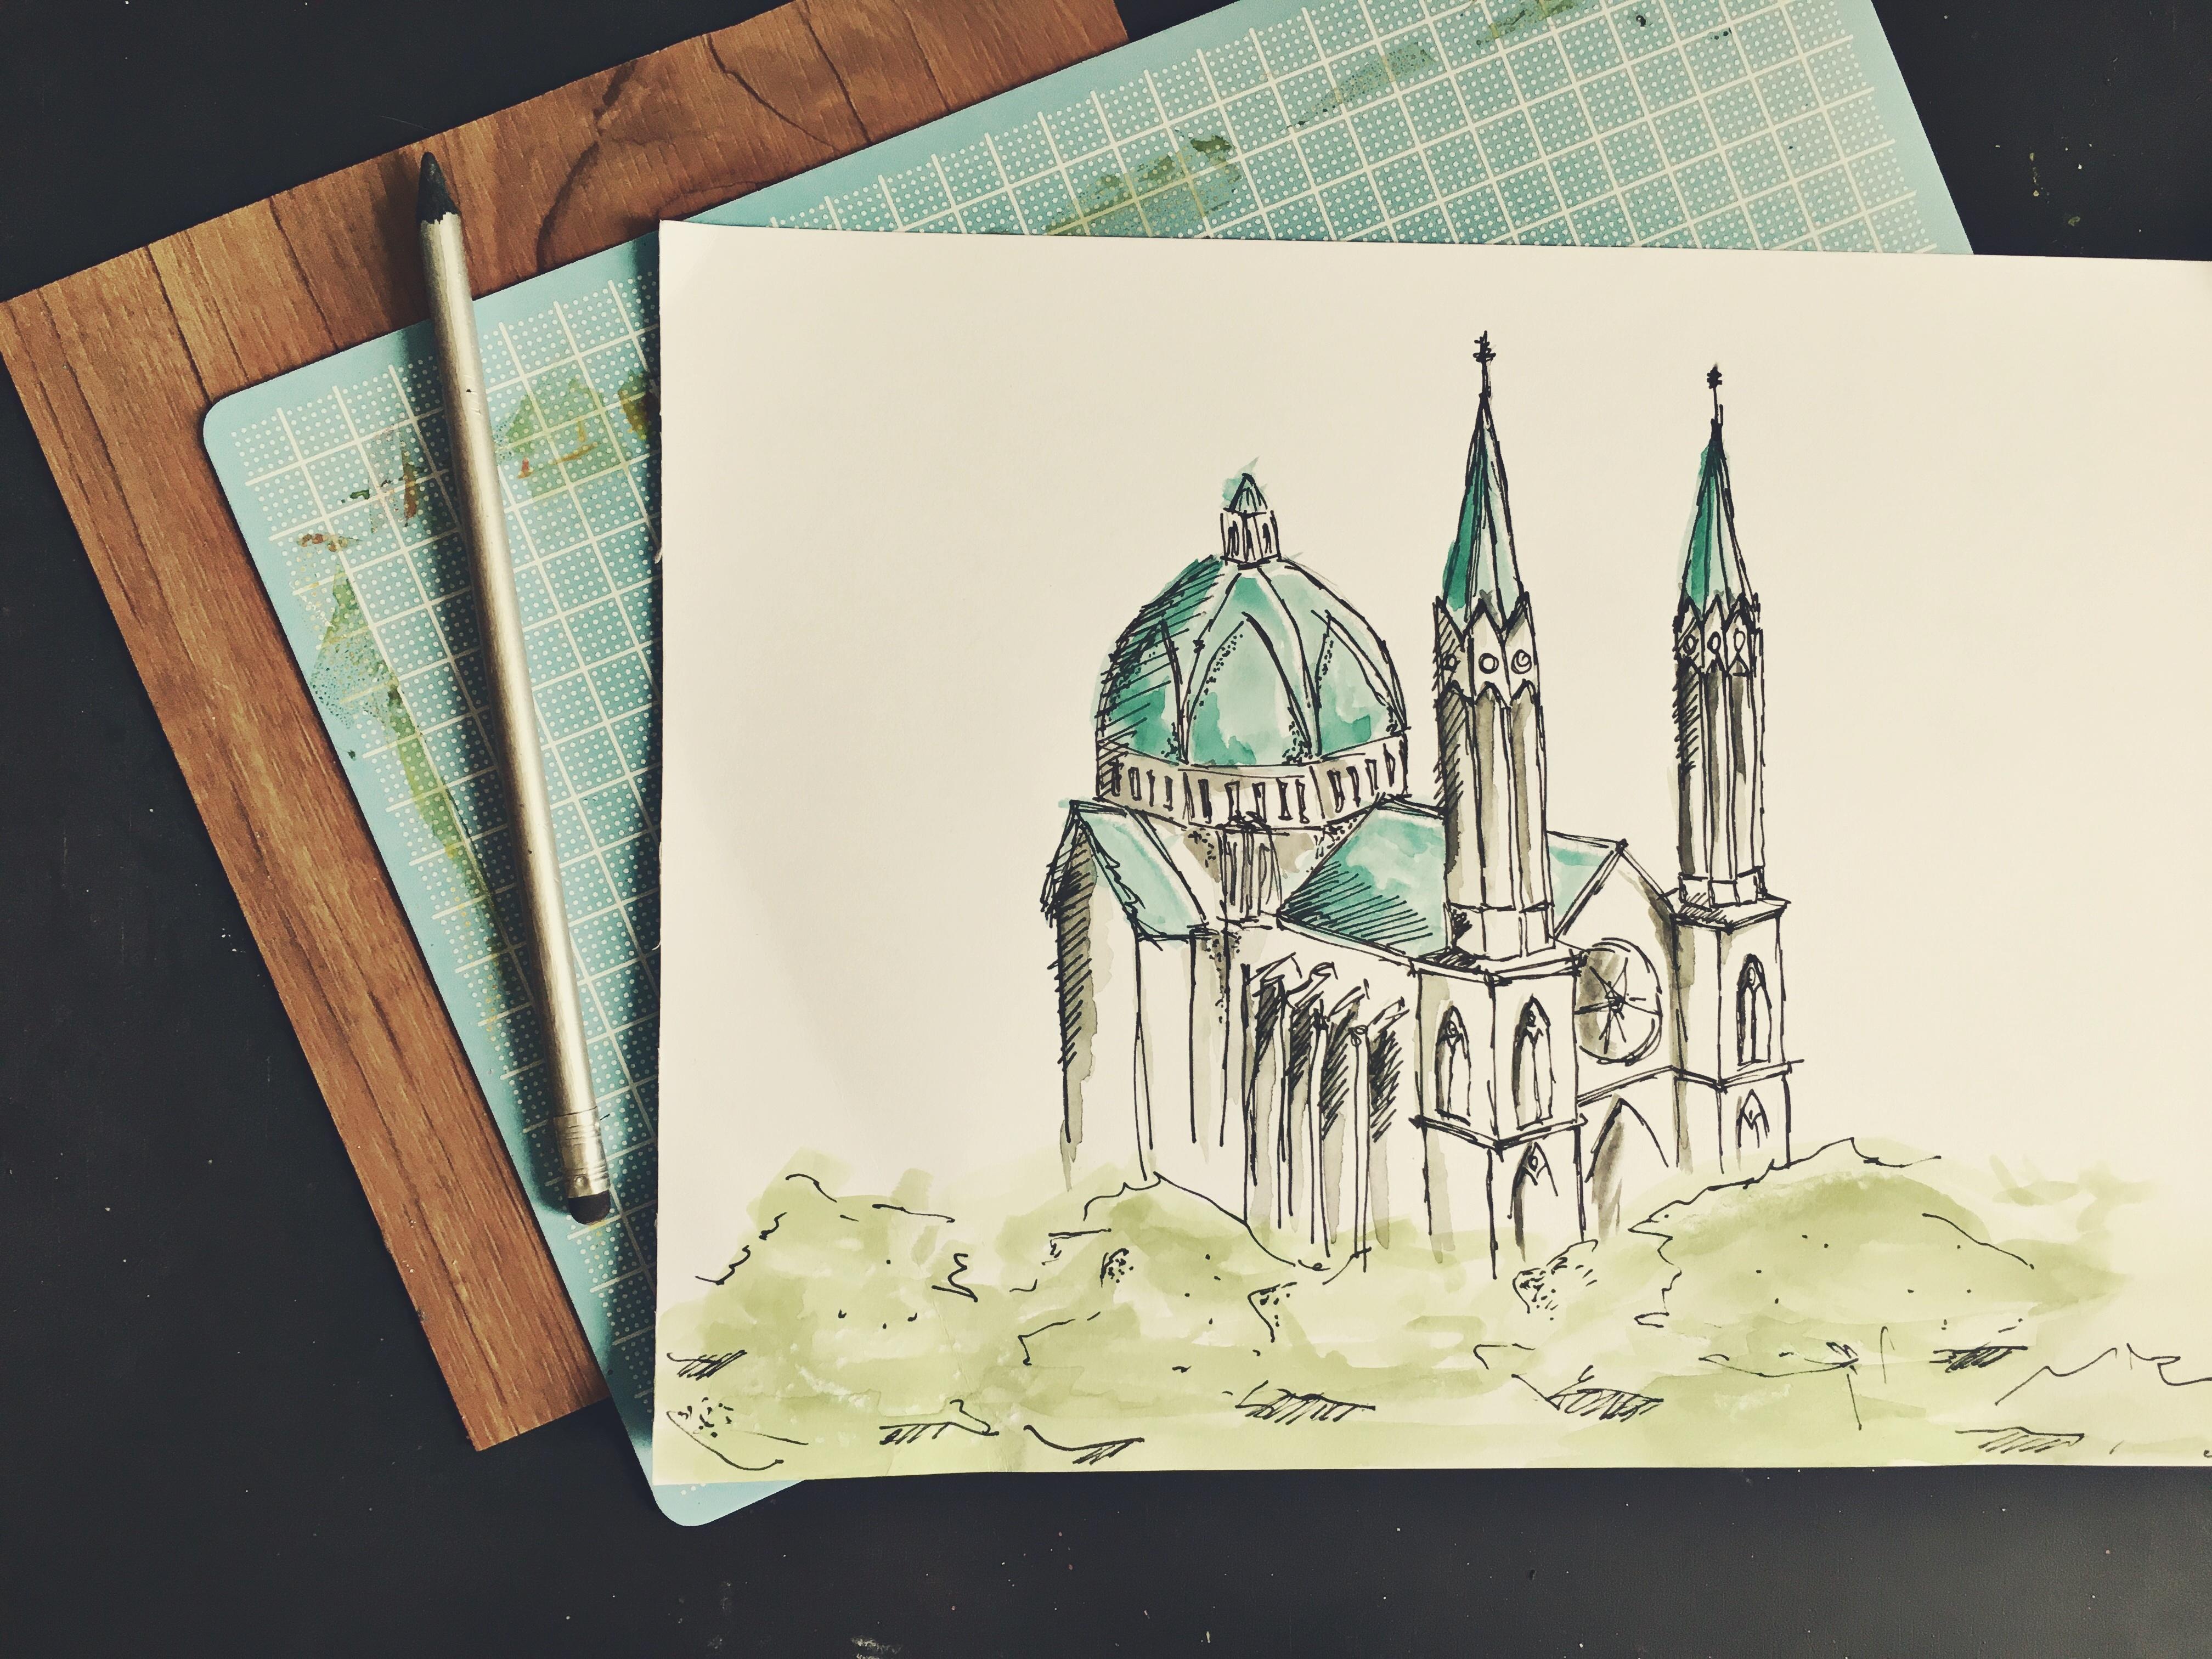 132 Gambar Sketsa Ilustrasi Masjid Gambarilus